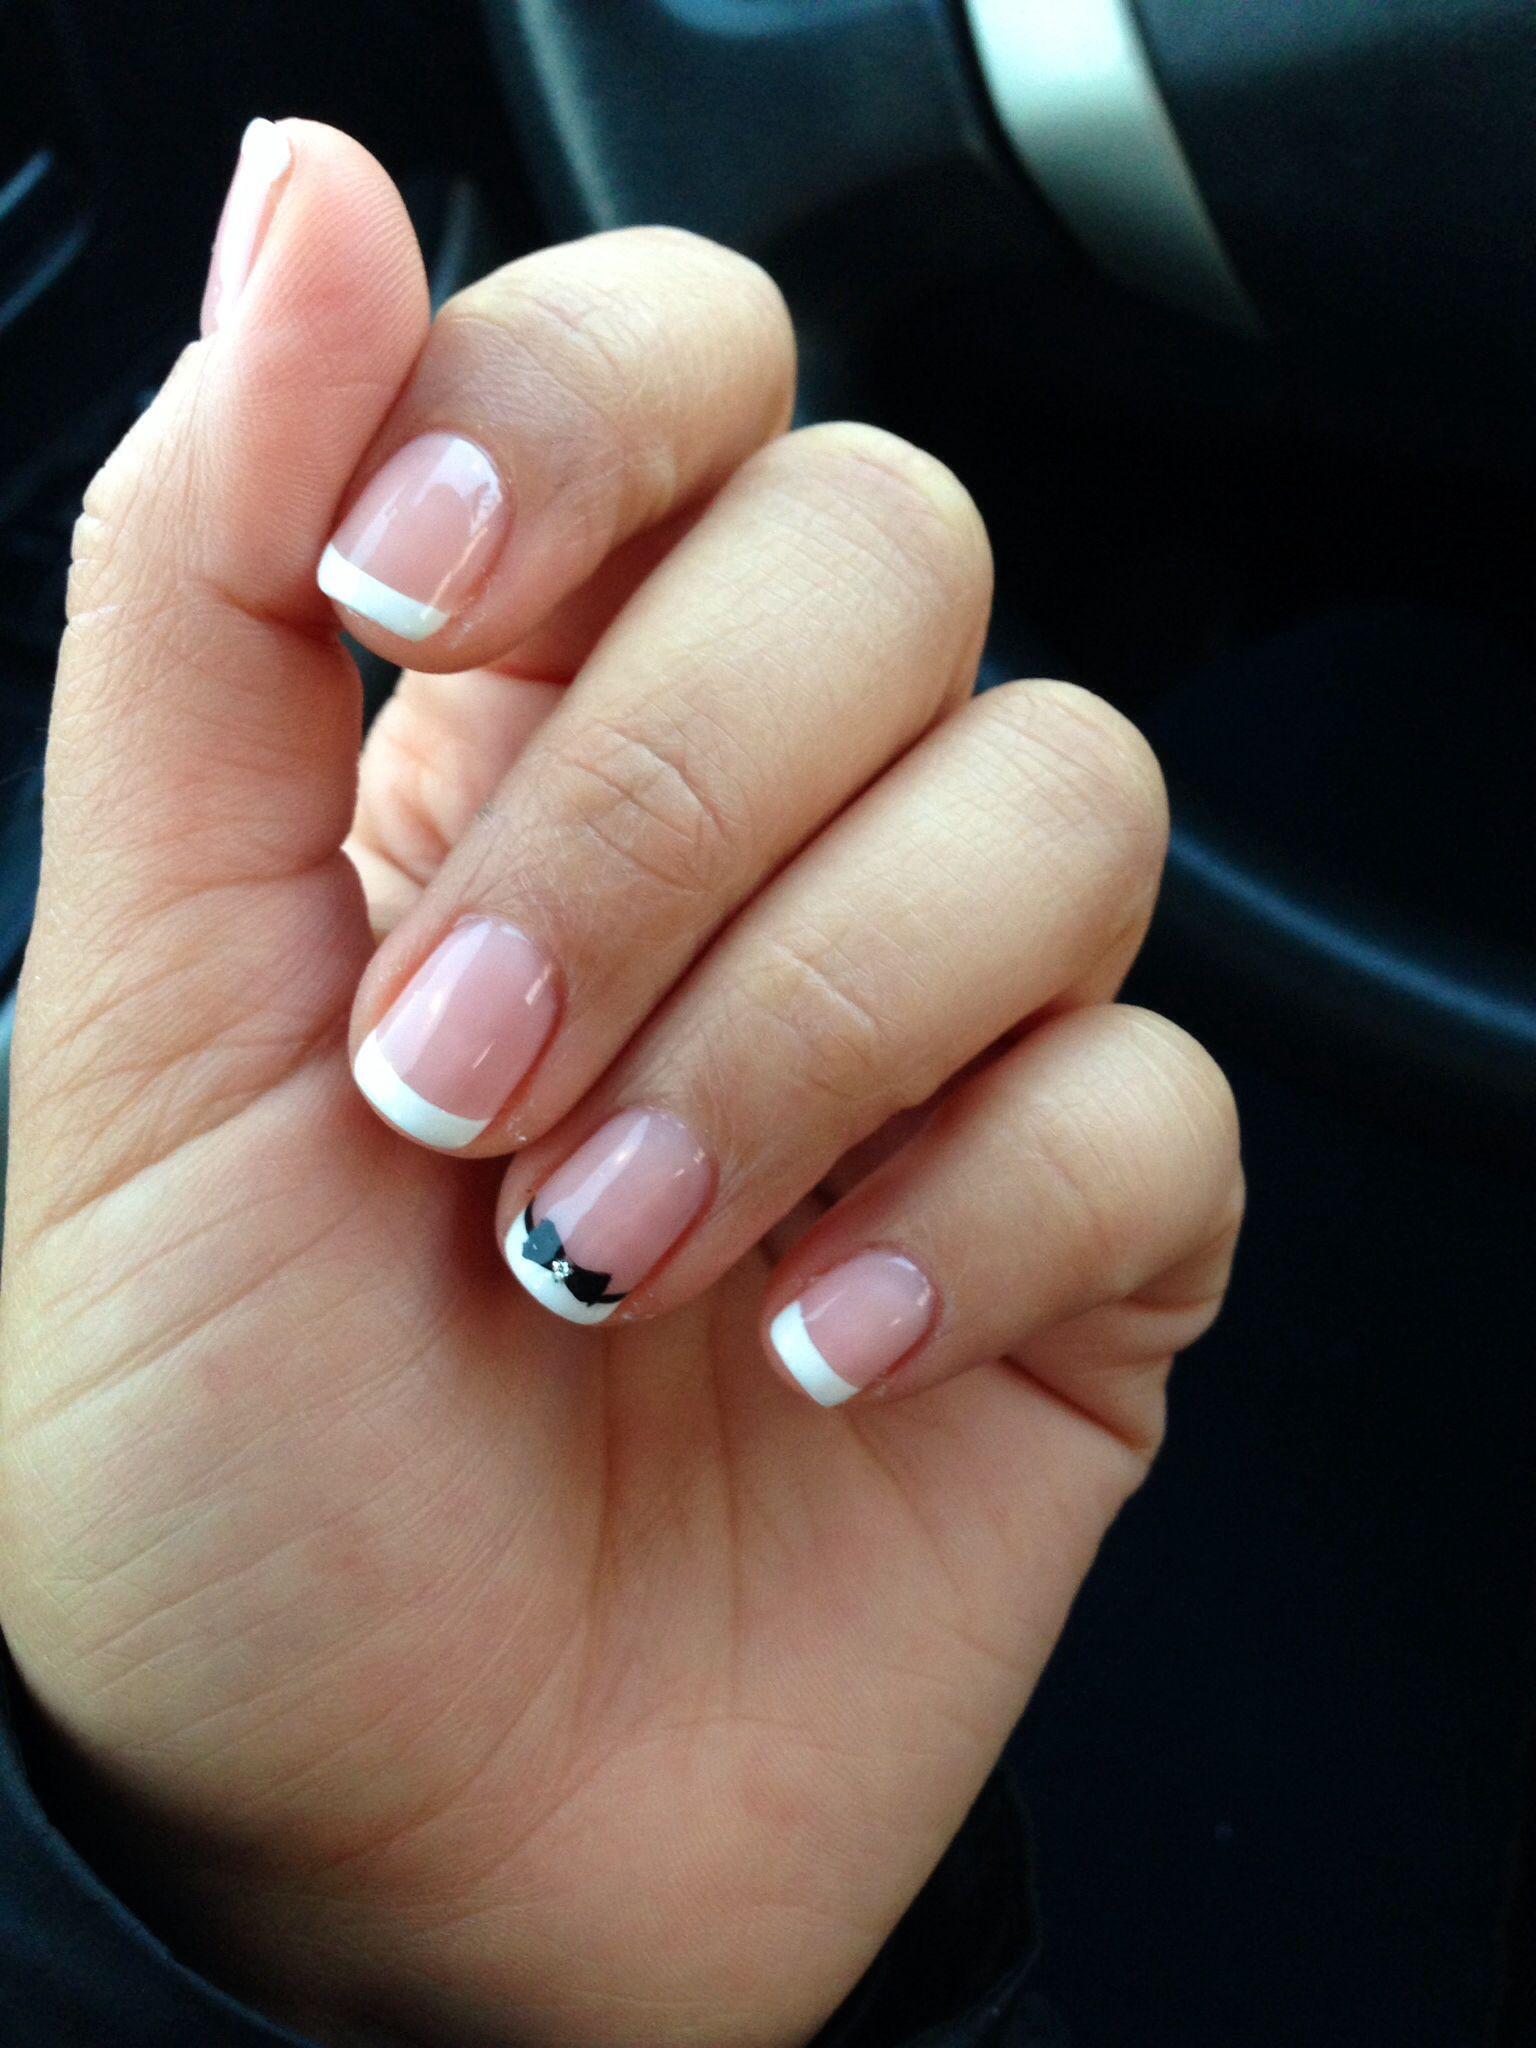 Perfect wedding nails for bride or bridesmaids | Nails ...